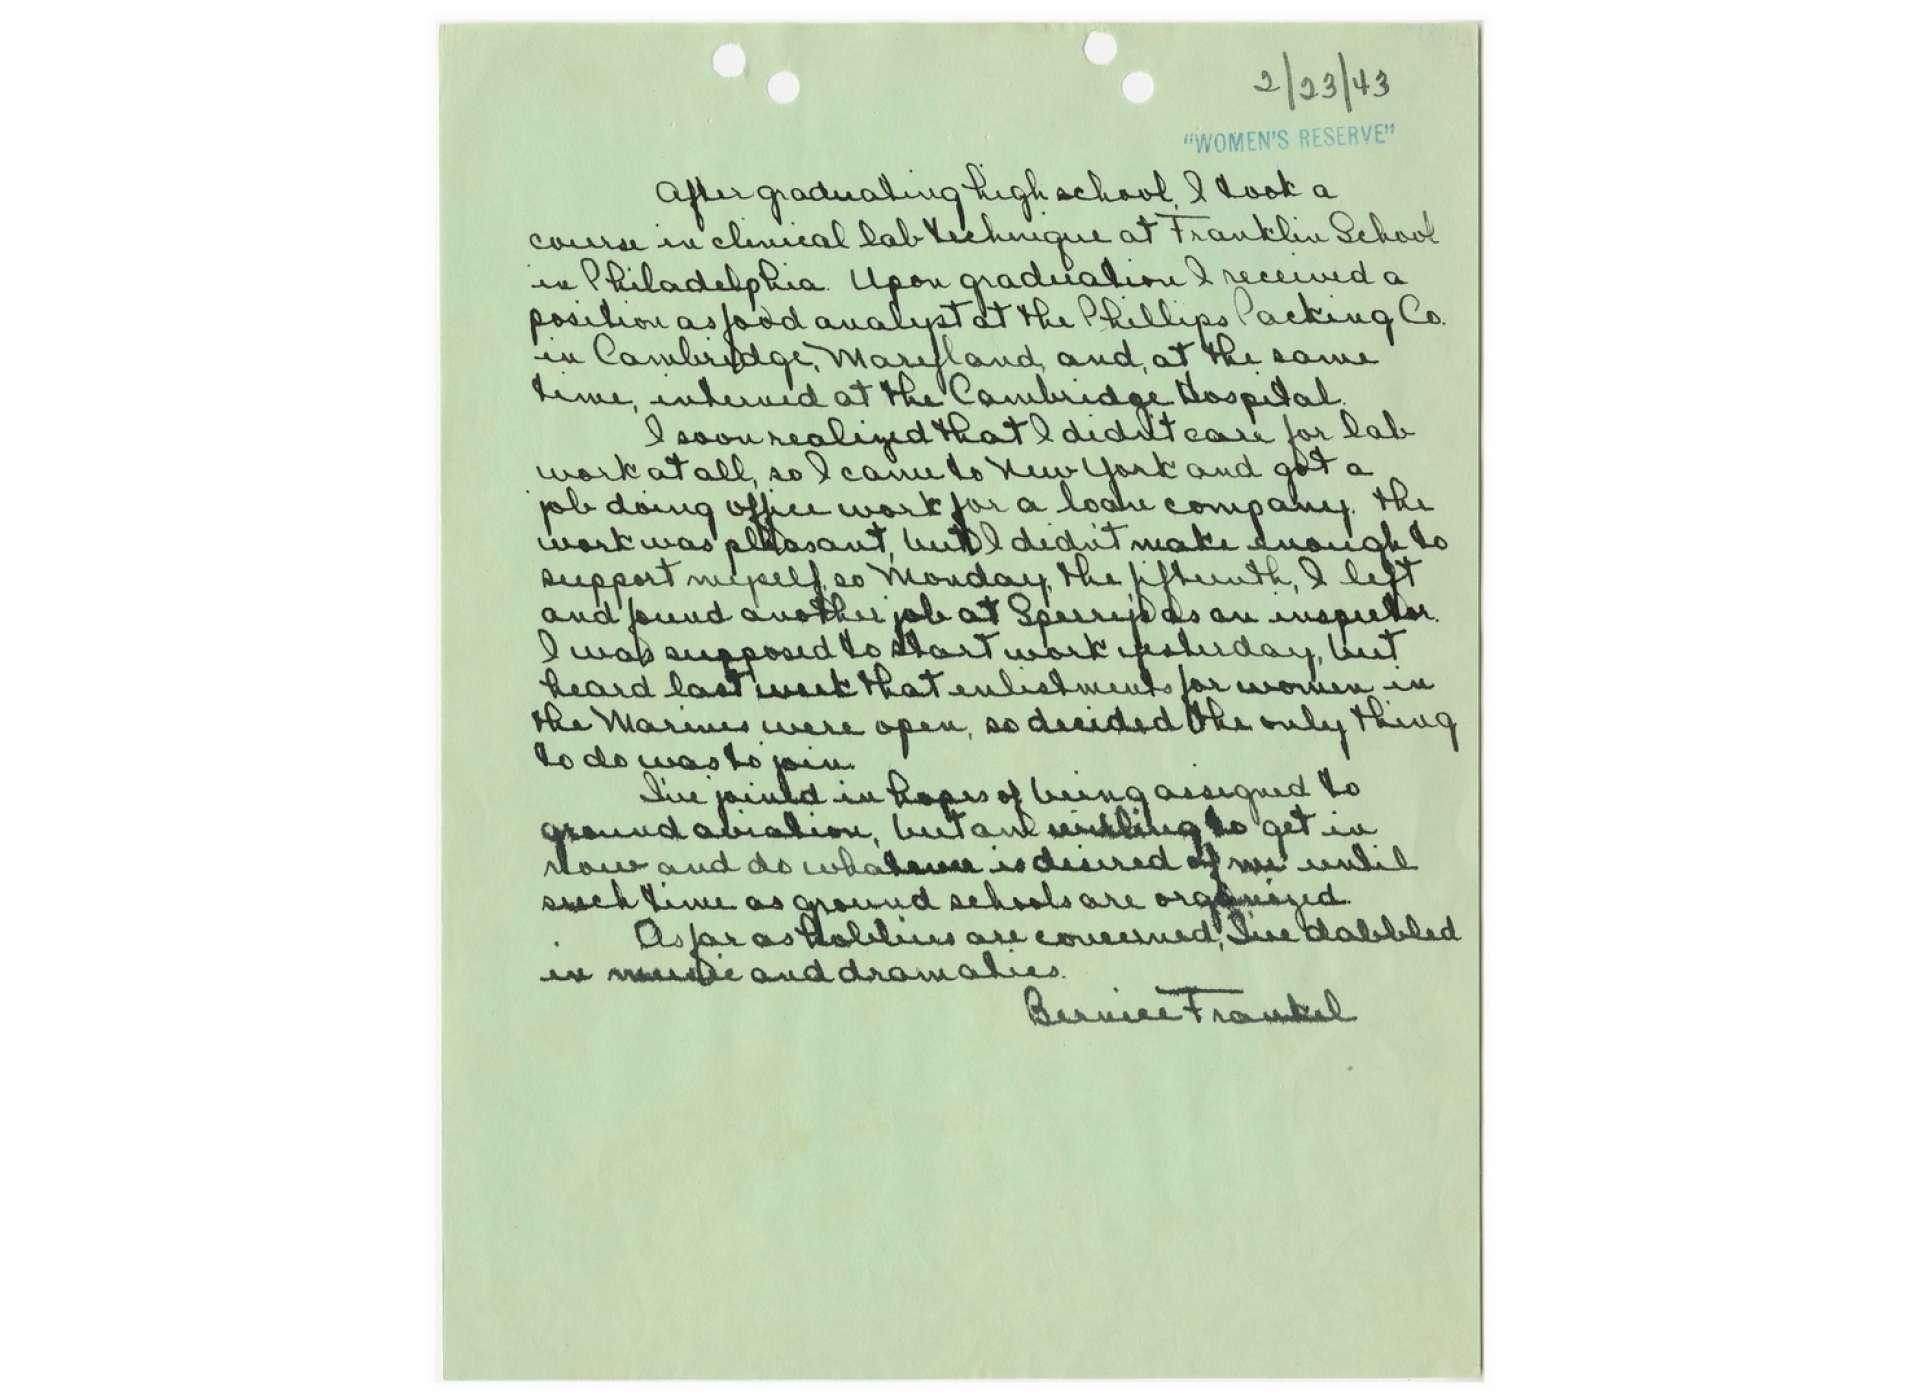 bea arthur letter